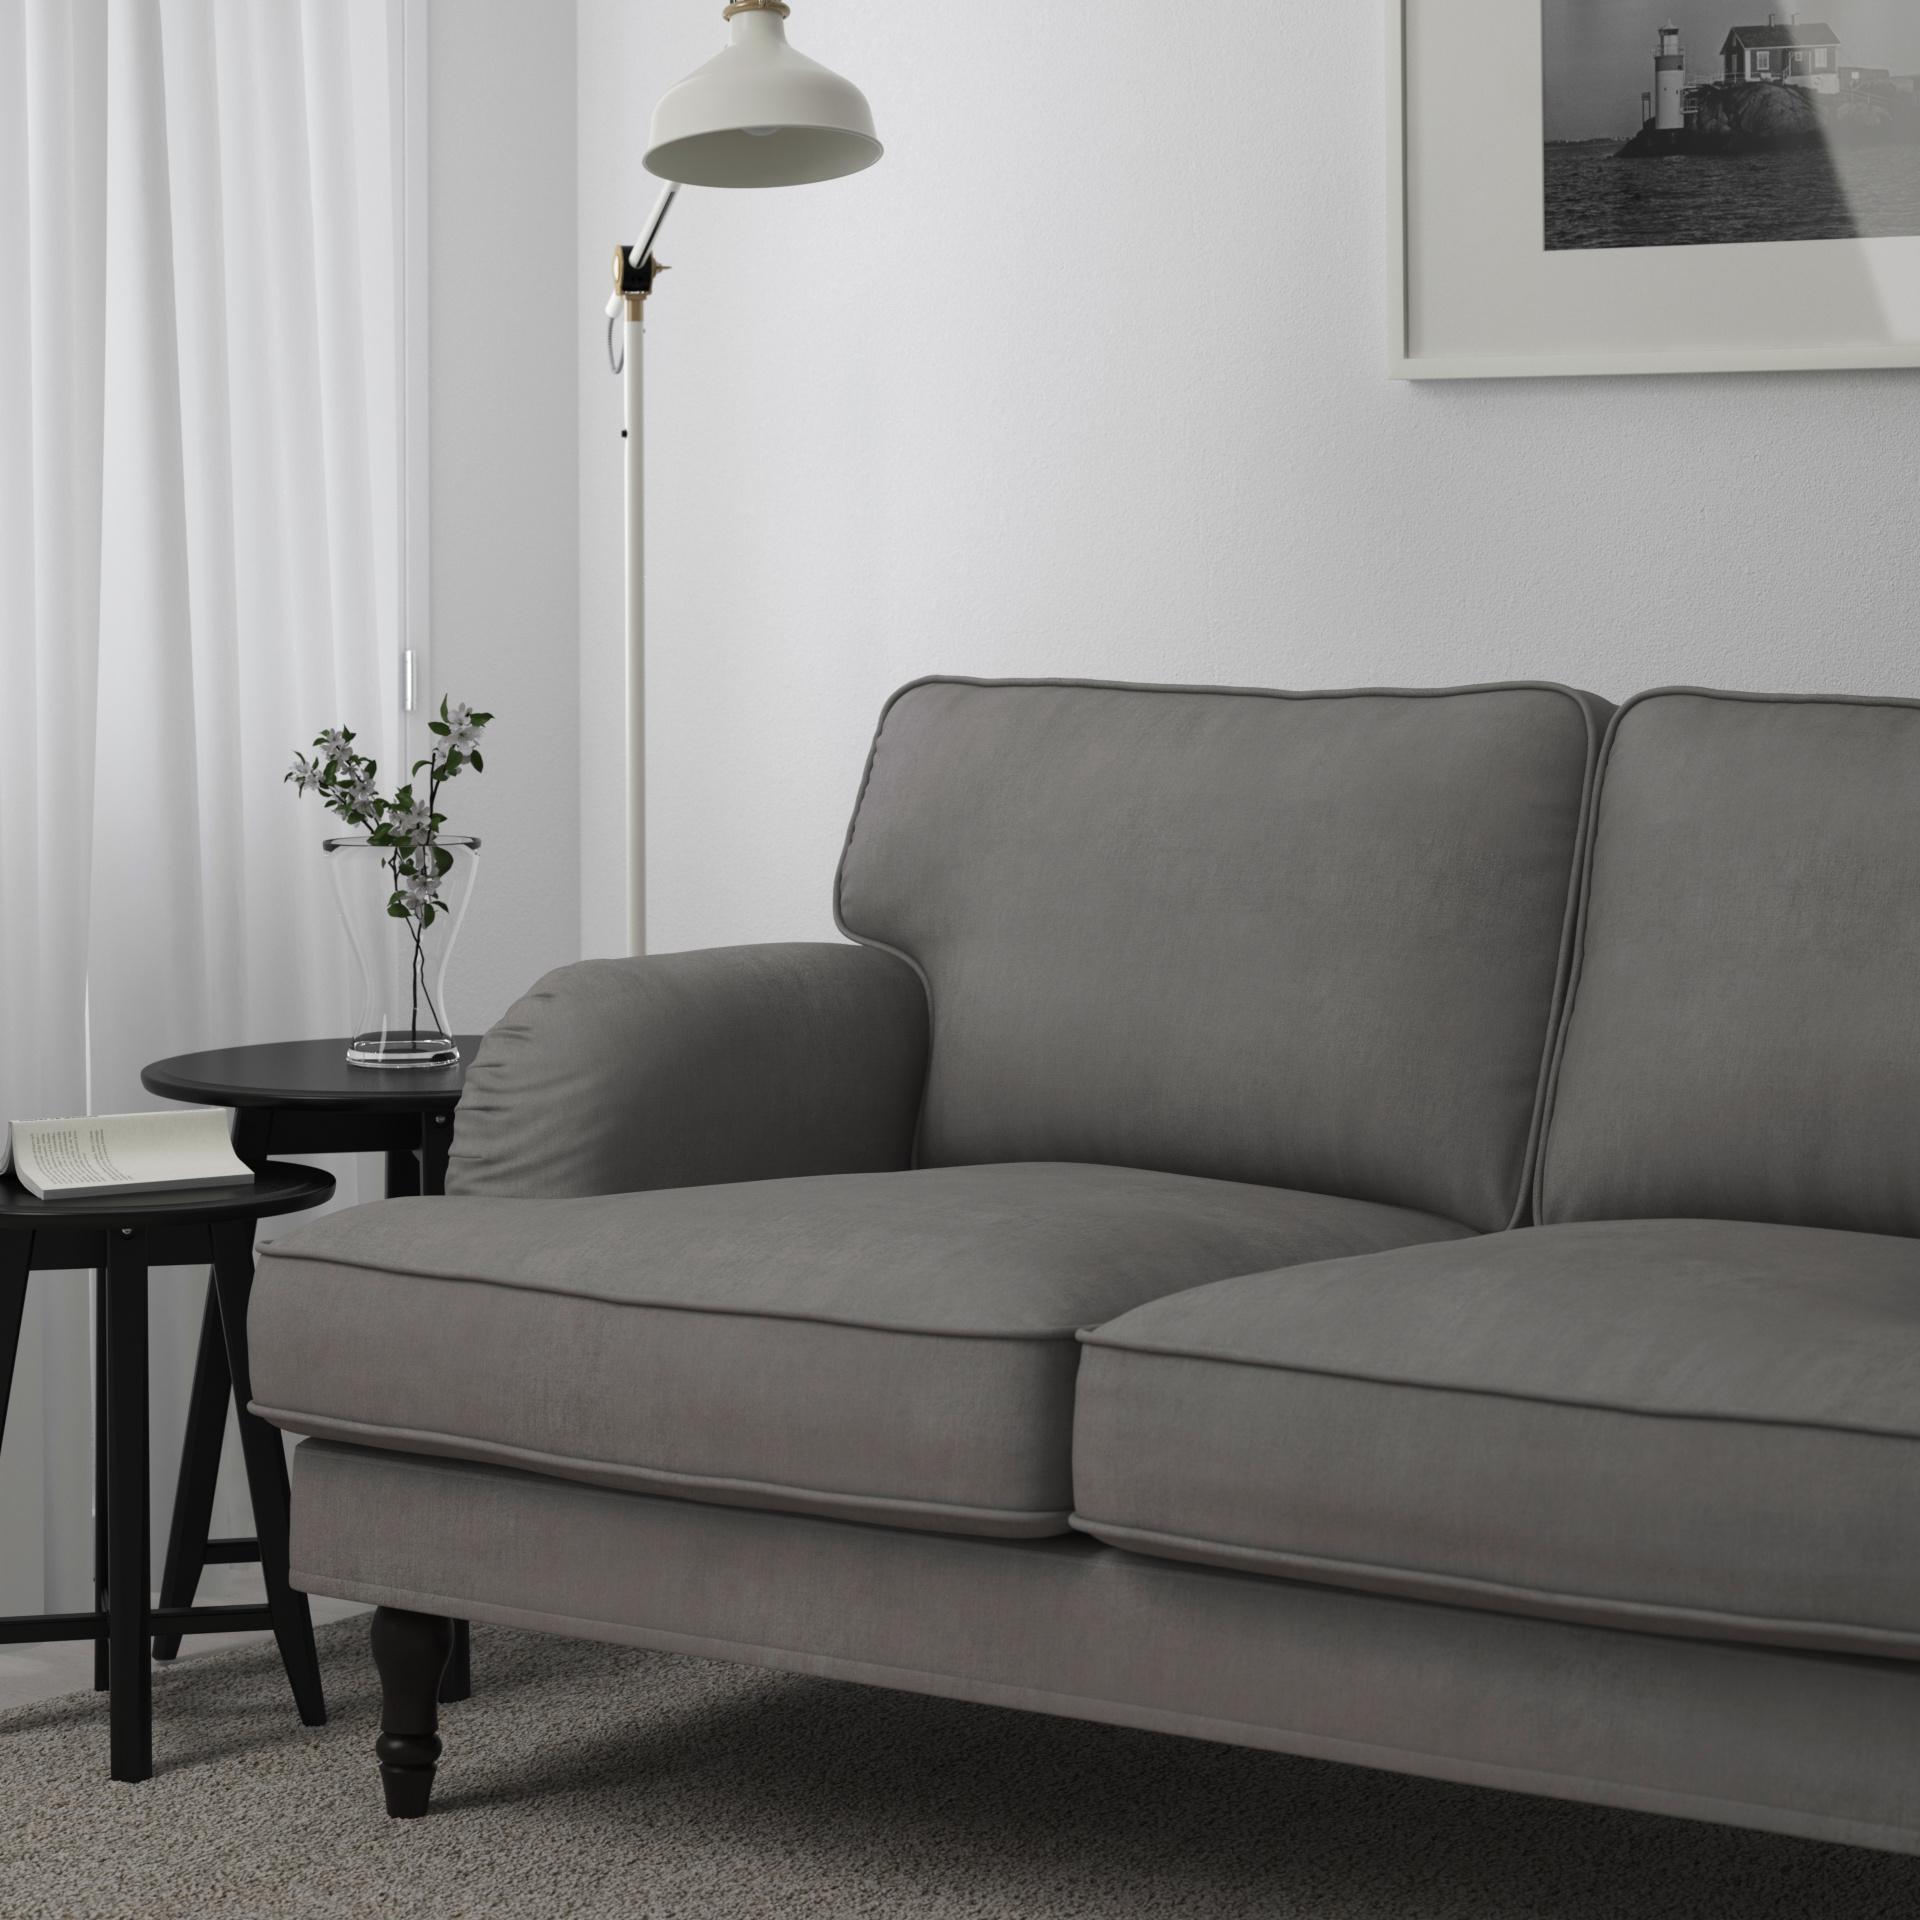 IKEA_008